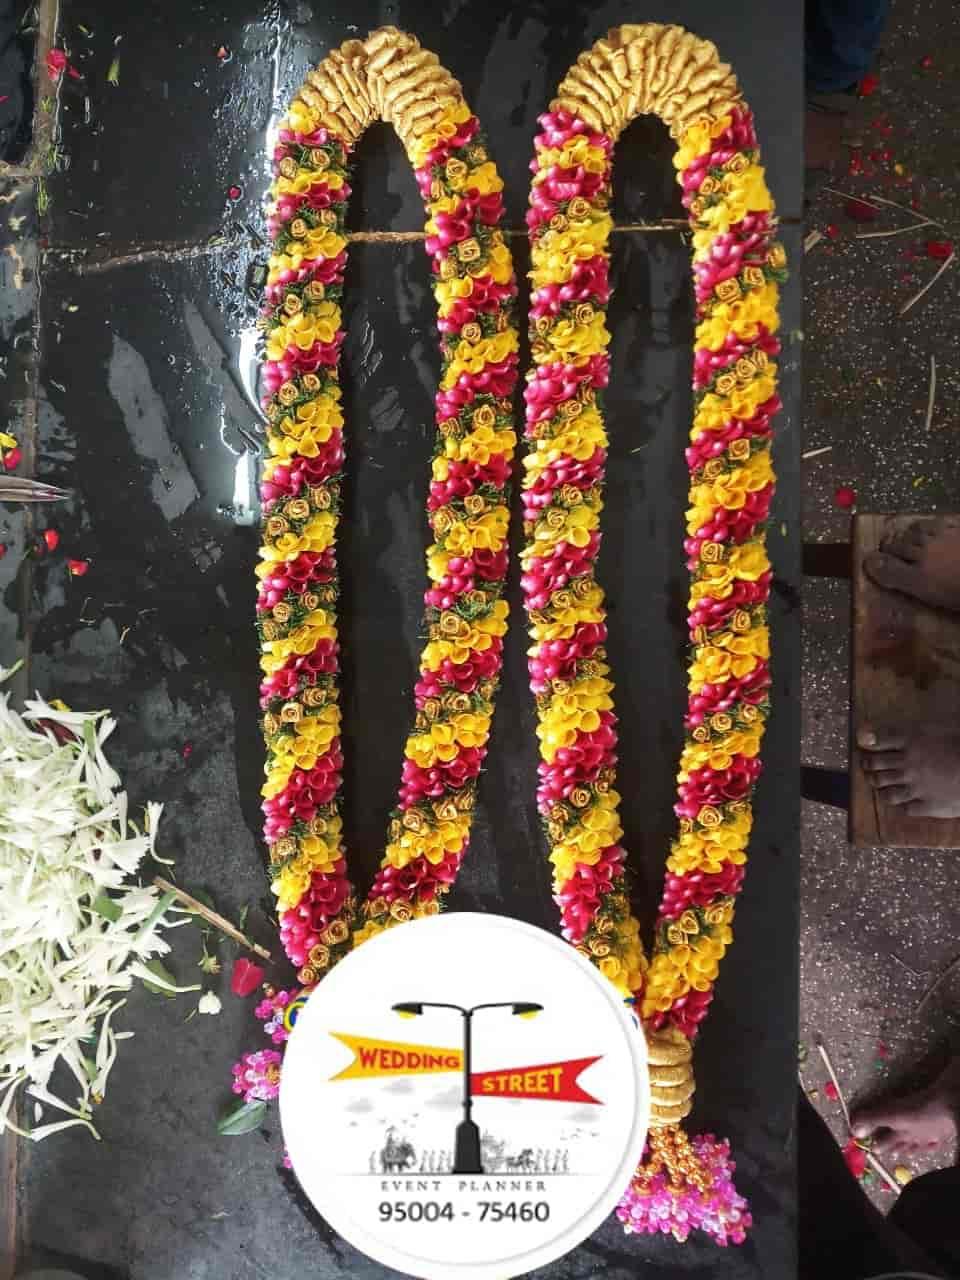 Wedding Street Photos, New Colony, Thoothukudi- Pictures